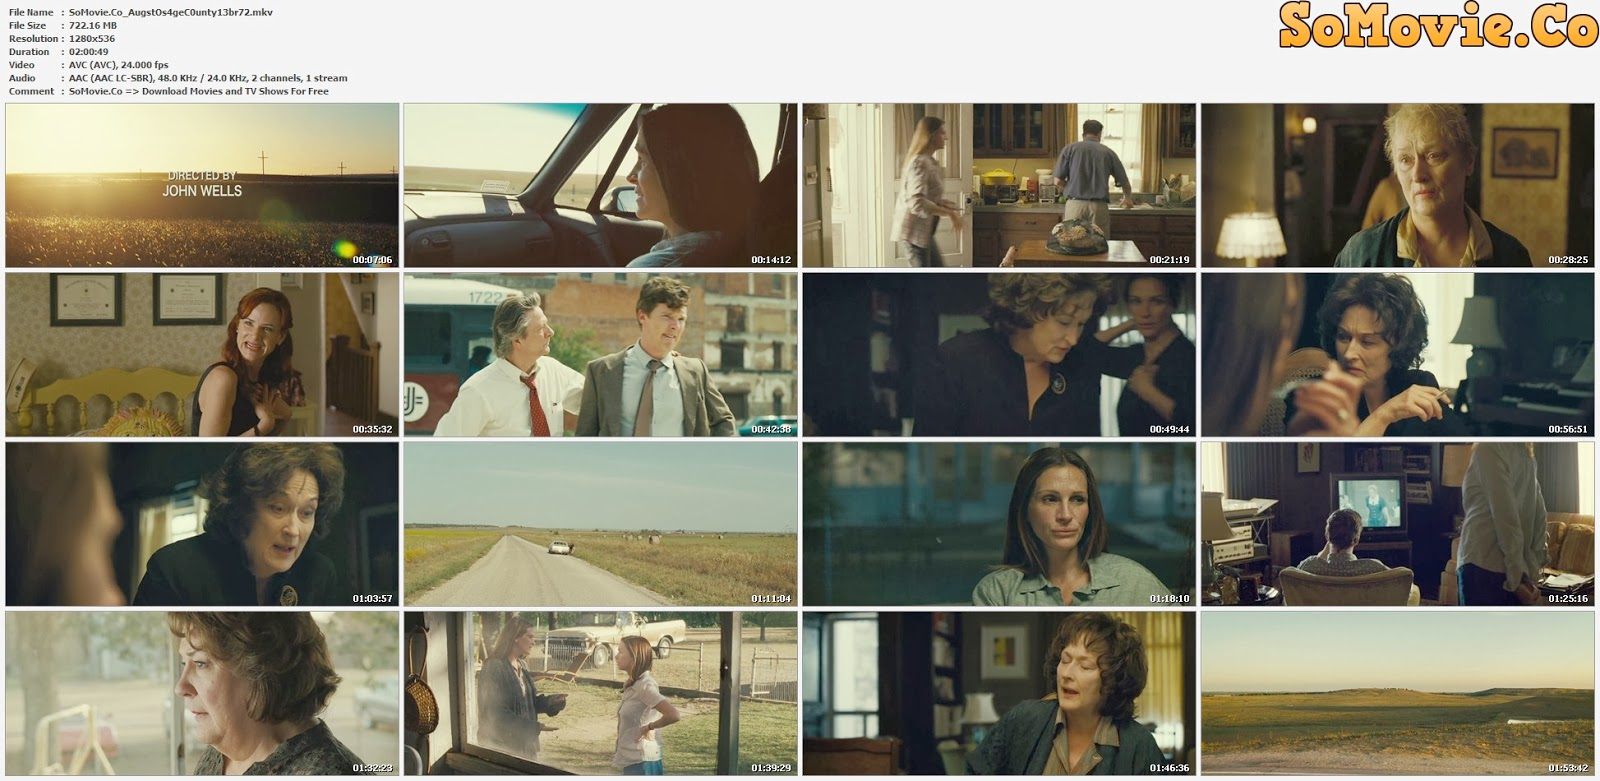 movie screenshot of August: Osage County fdmovie.com